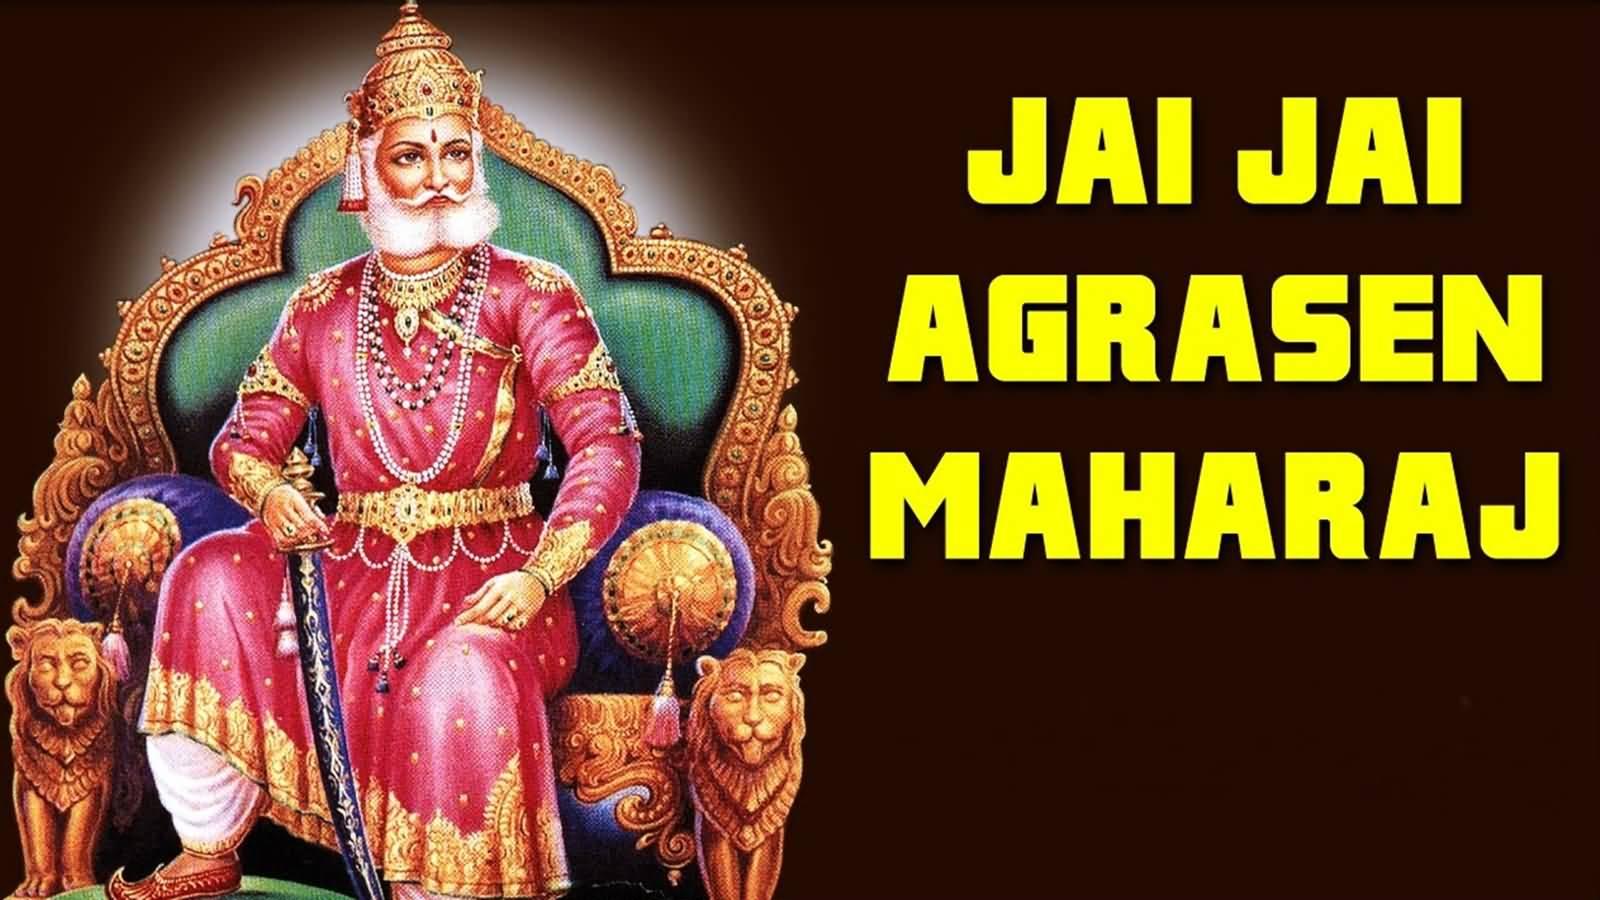 Jai Jai Agrasen Maharaj Happy Maharaja Agrasen Jayanti